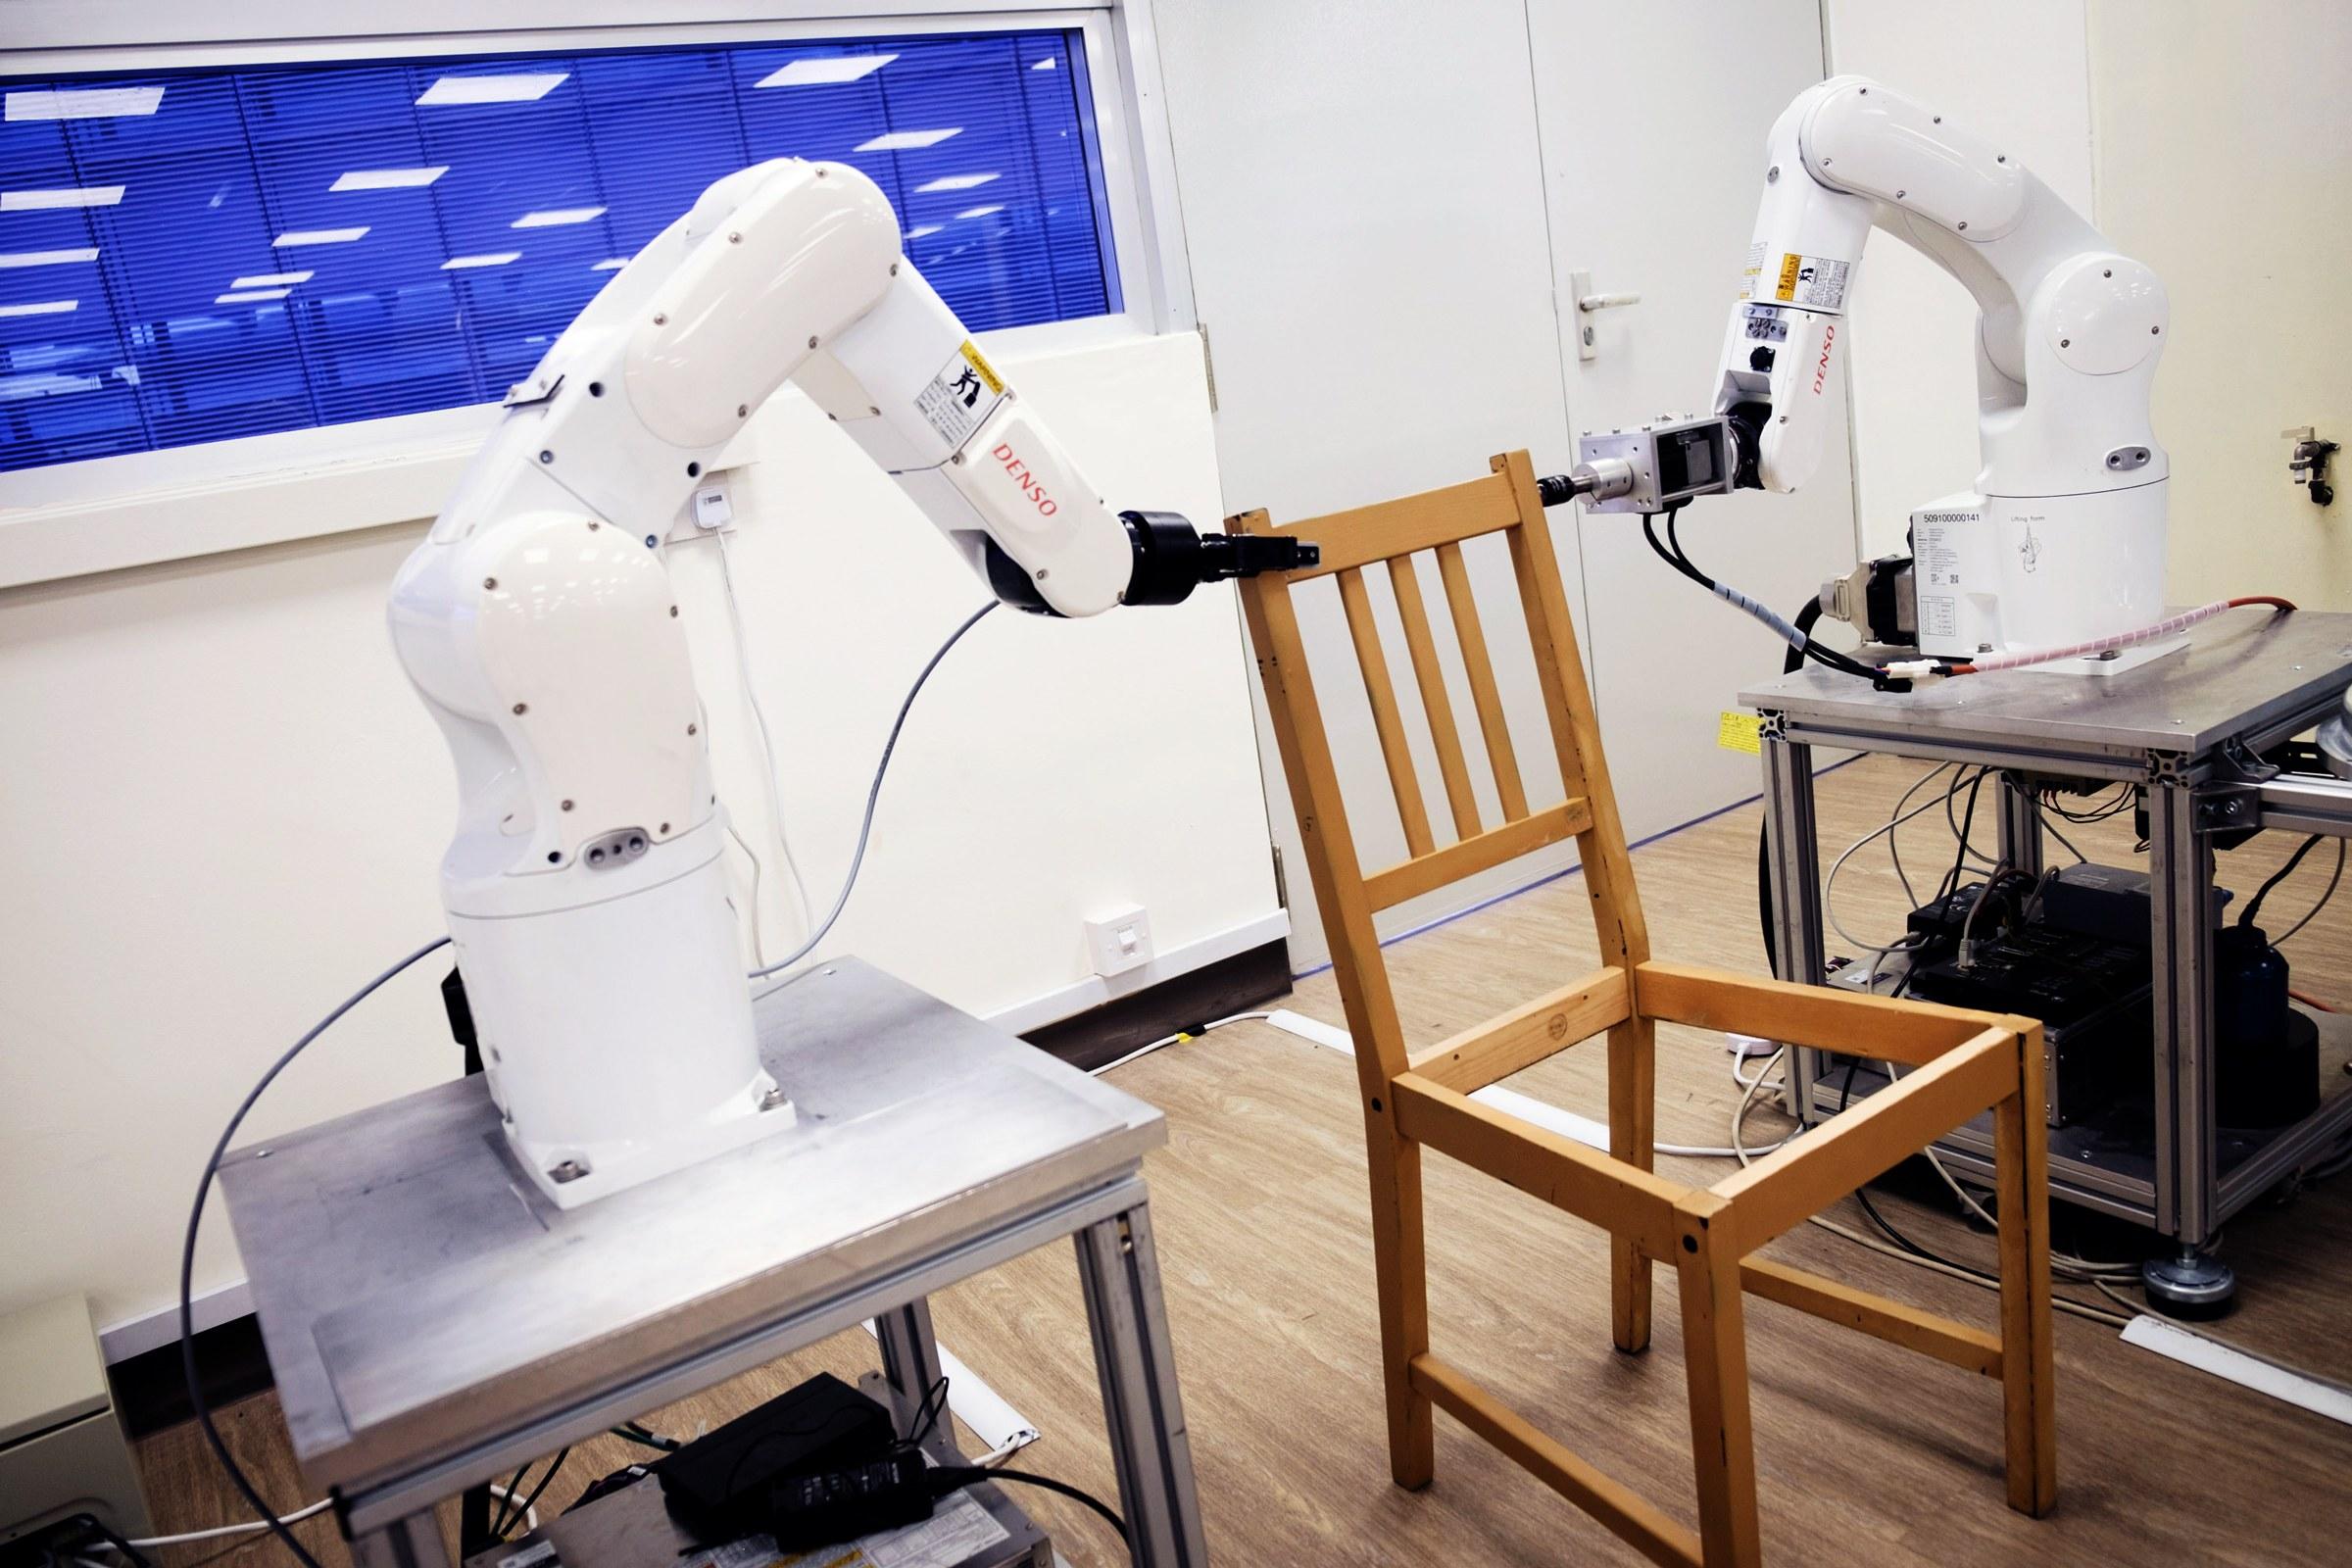 Ikea chair assembled by robots